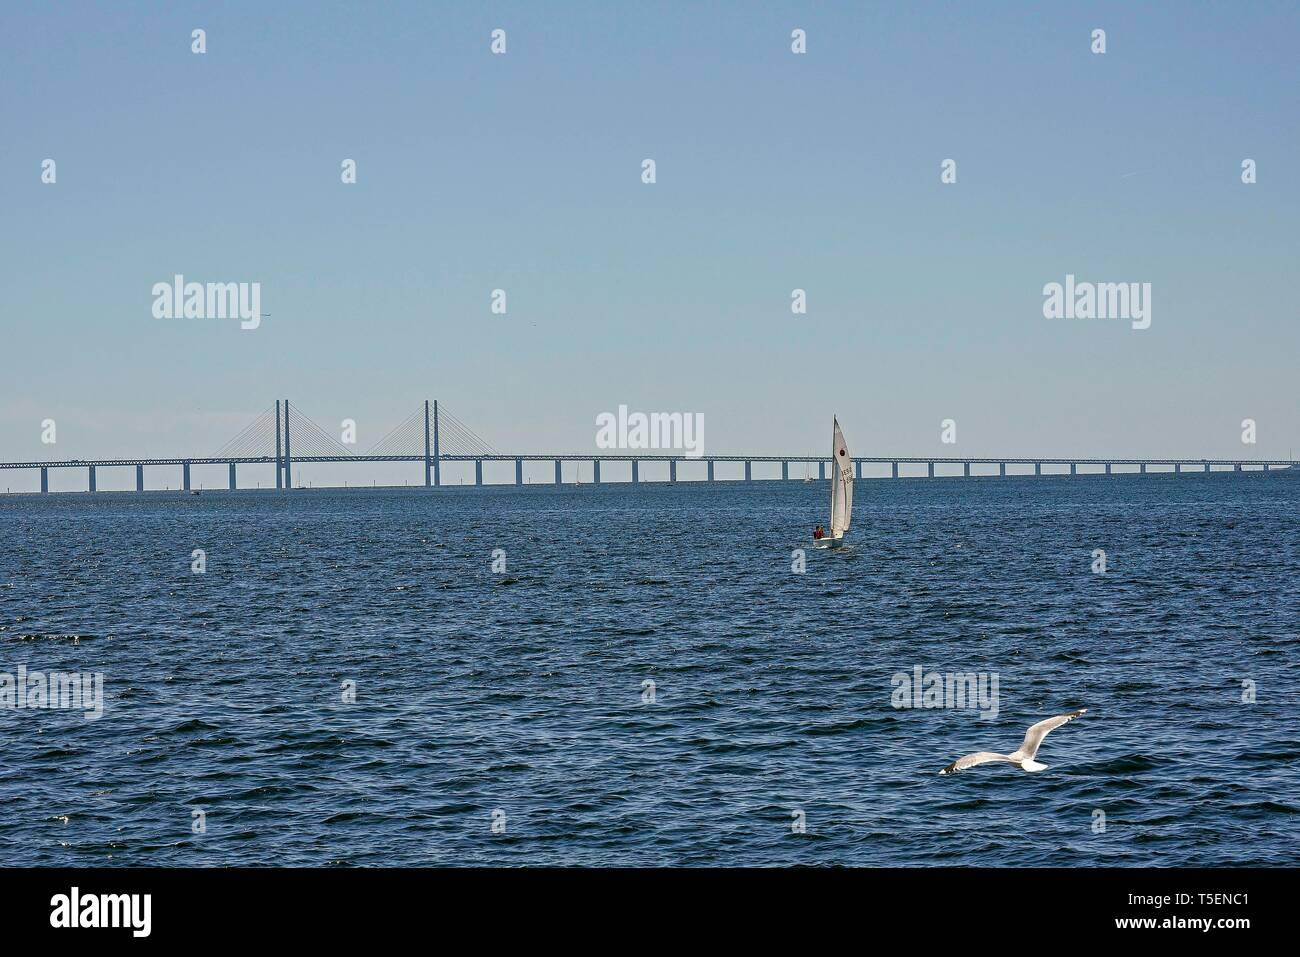 The Oresund Bridge crossing the Oresund Strait, connecting Copenhagen Denmark and Malmo Sweden, its the longest combined road and rail bridge in Europ Stock Photo